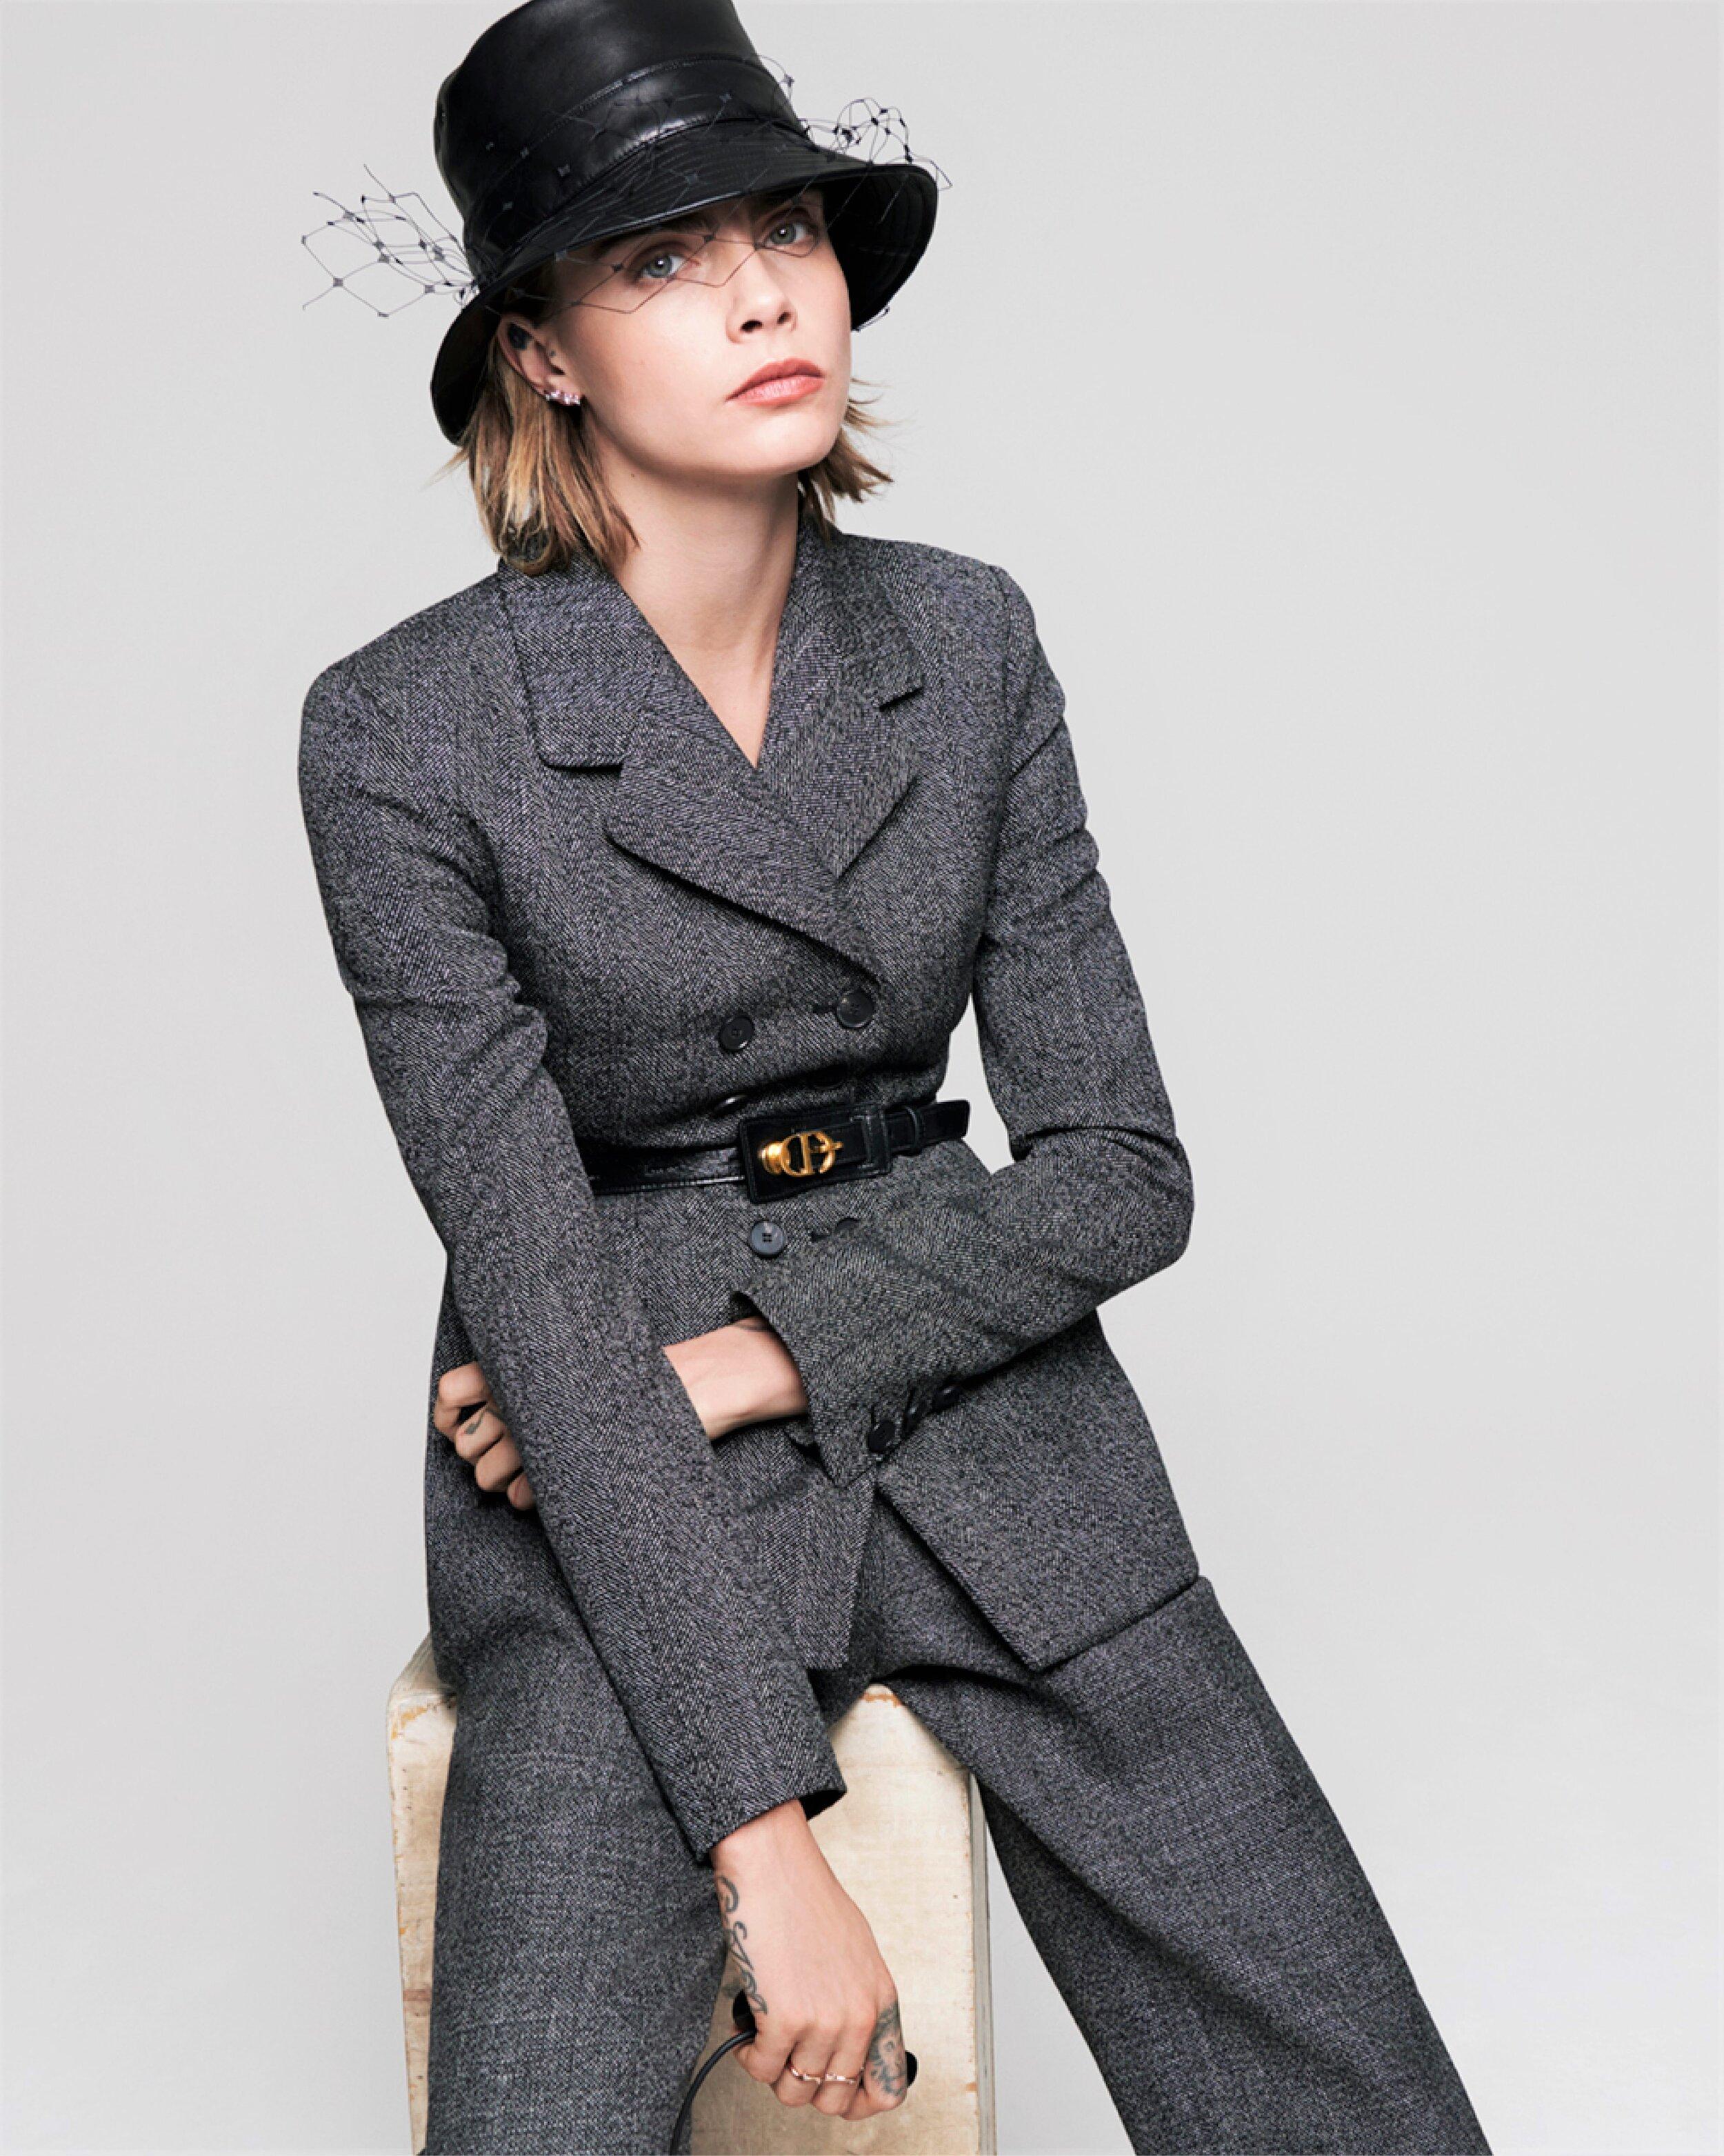 Cara Delevingne-Dior-V Magazine  (1).jpg